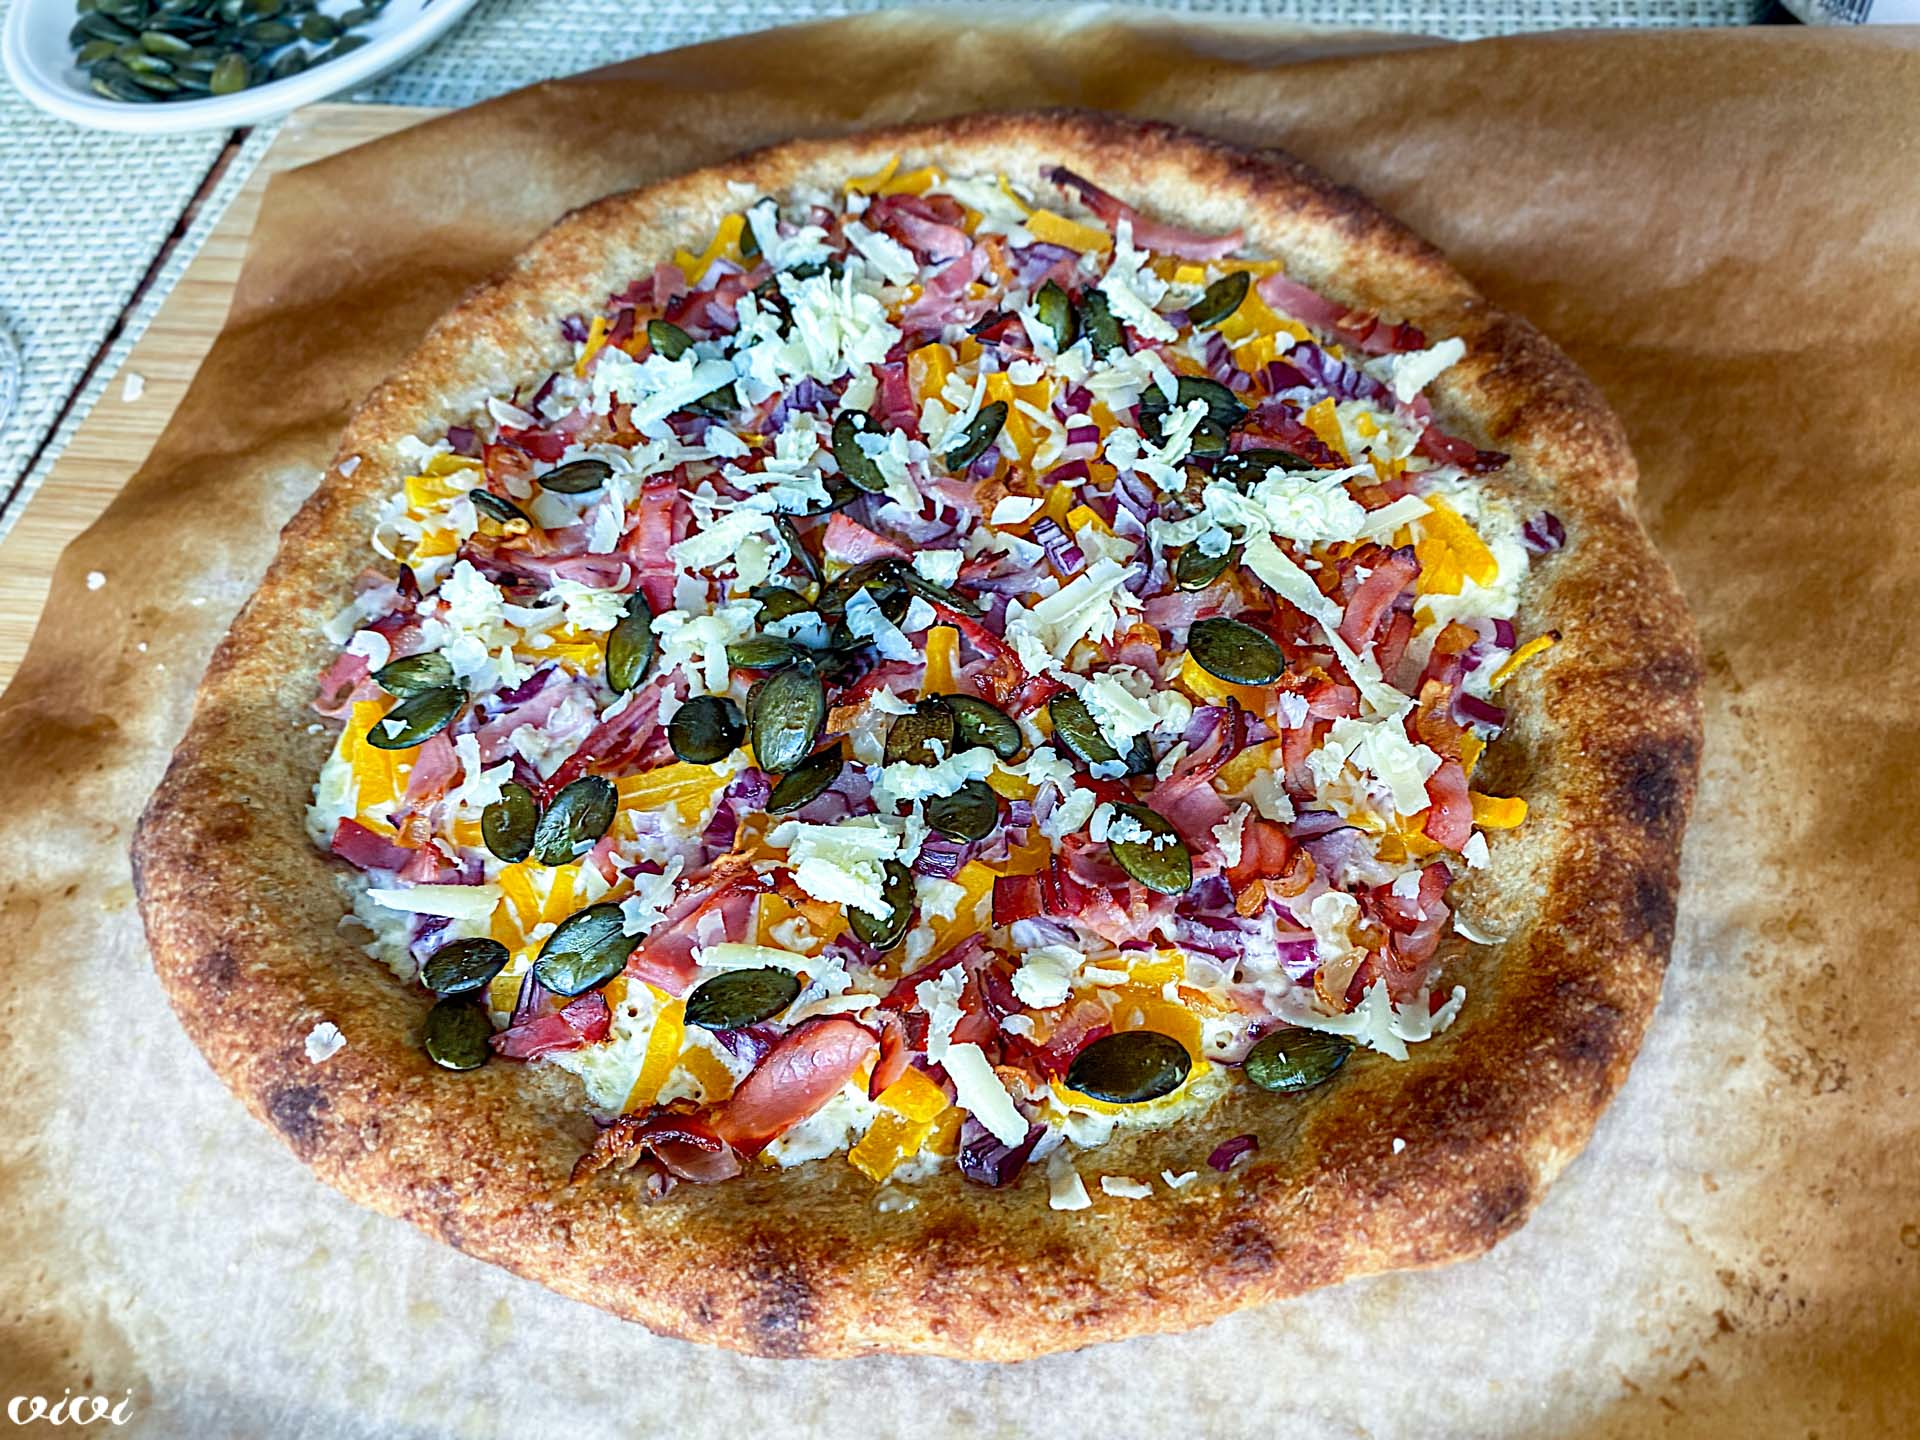 polnozrnata pizza z bučo slanino in hrenom2